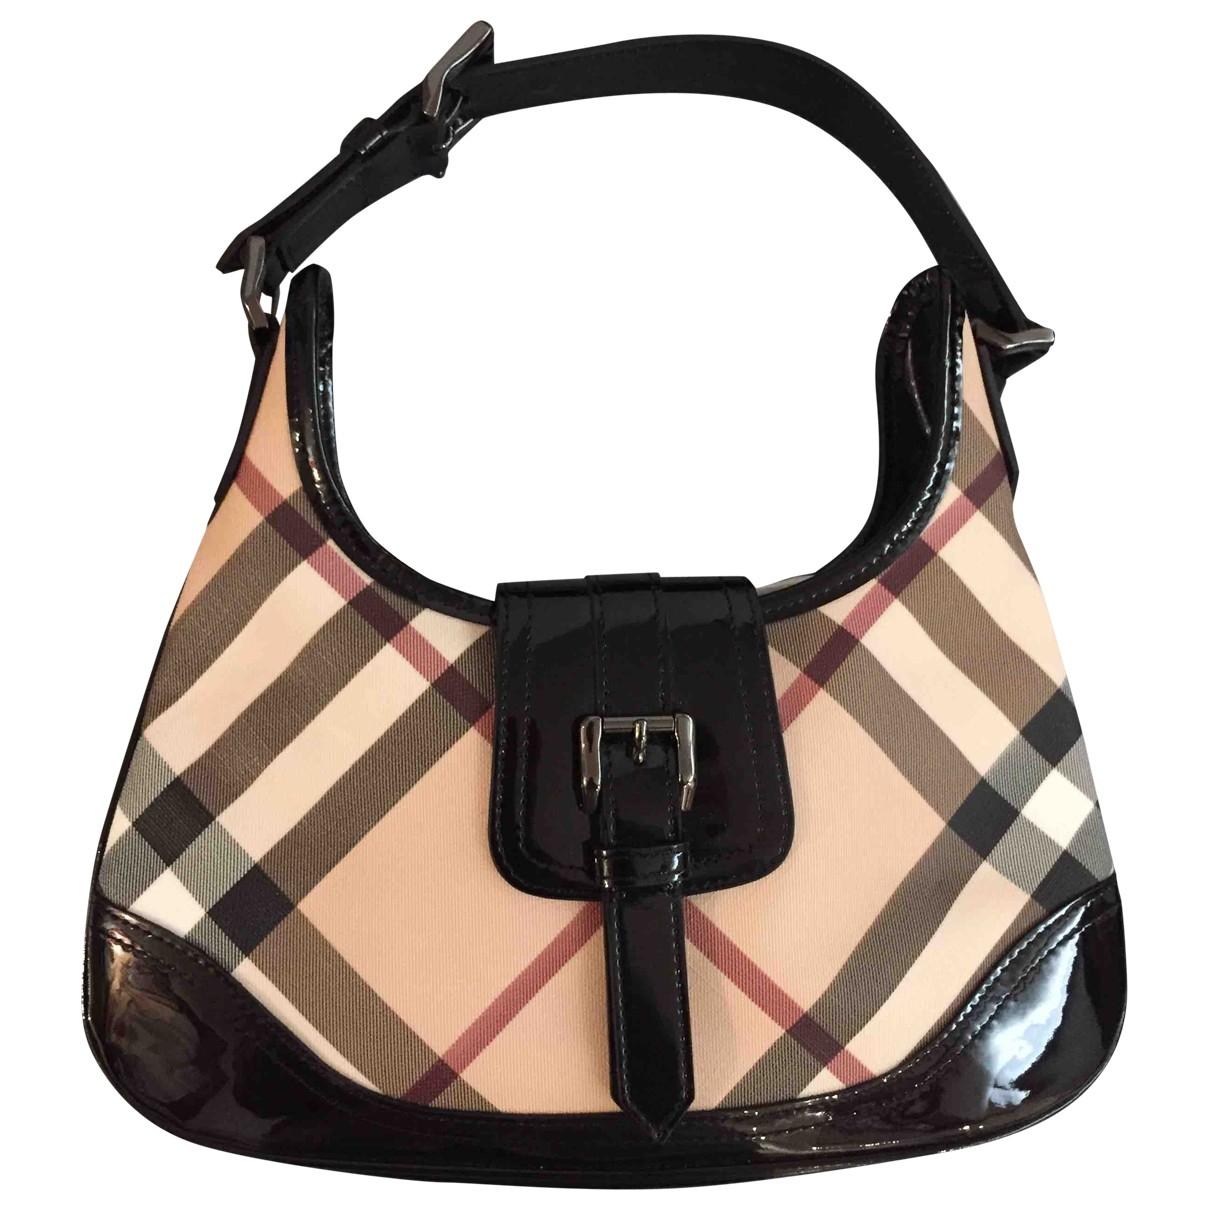 Burberry \N Clutch bag for Women \N